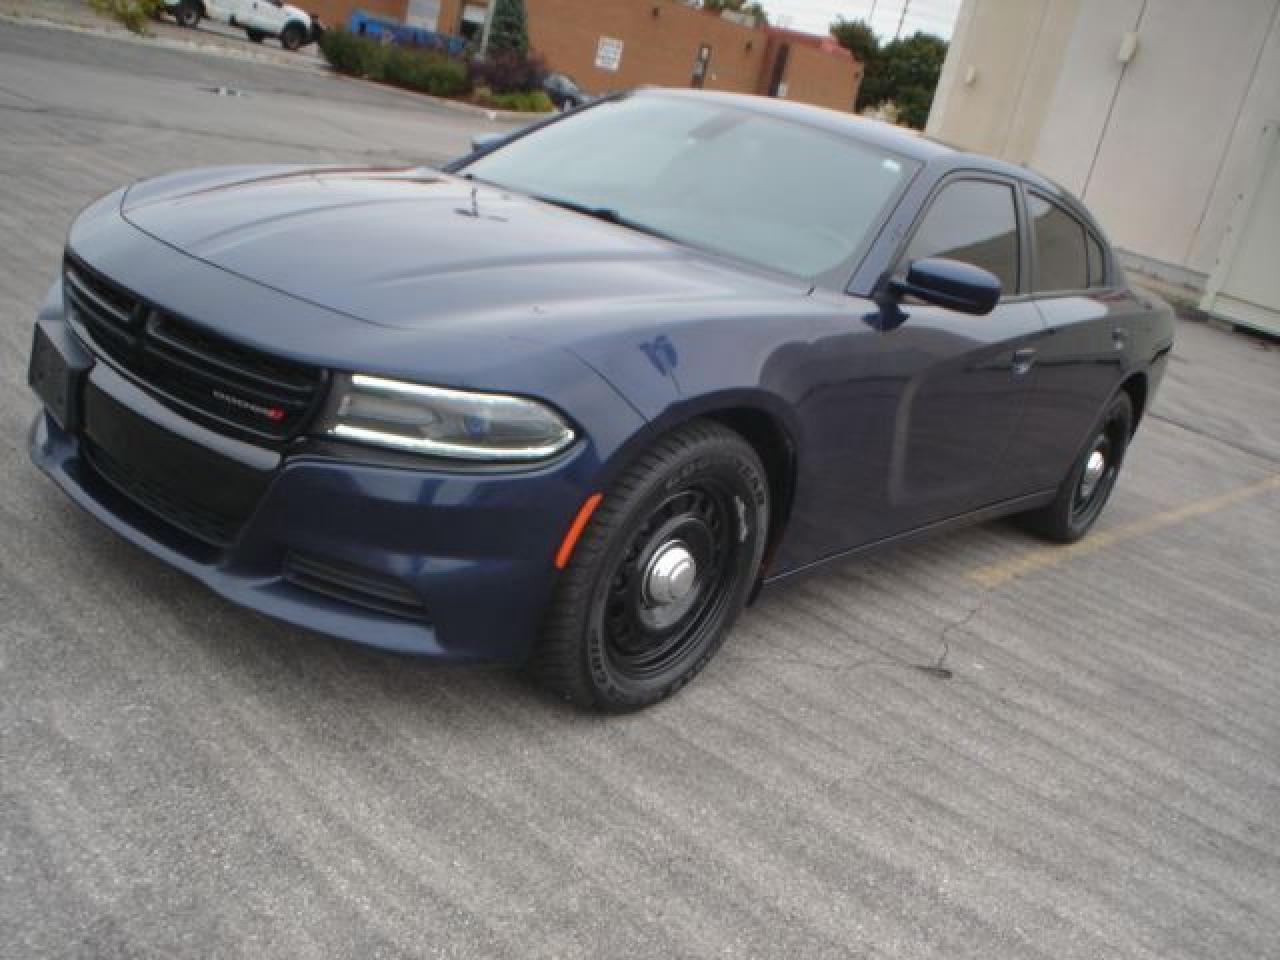 2016 Dodge Charger 5.7 HEMI,AWD,EX POLICE